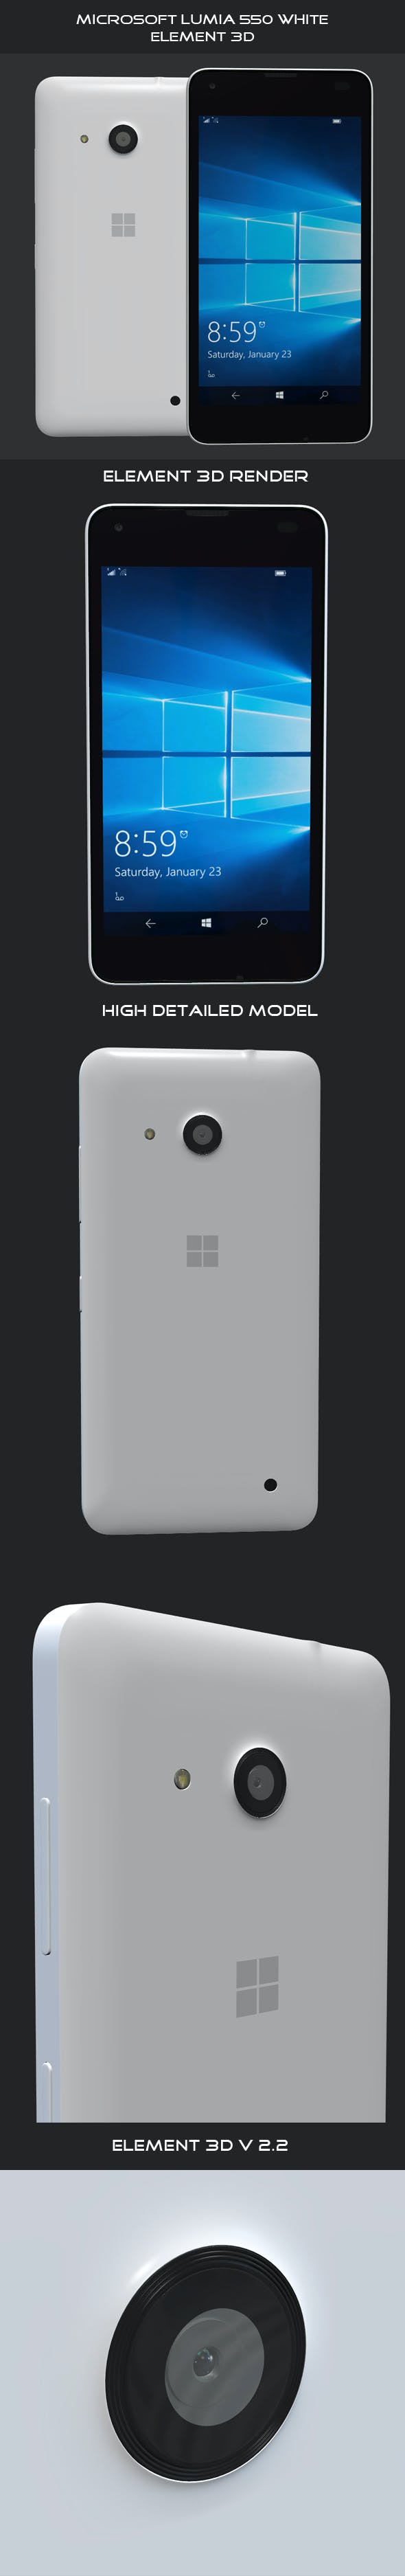 Microsoft Lumia 550 White - 3DOcean Item for Sale